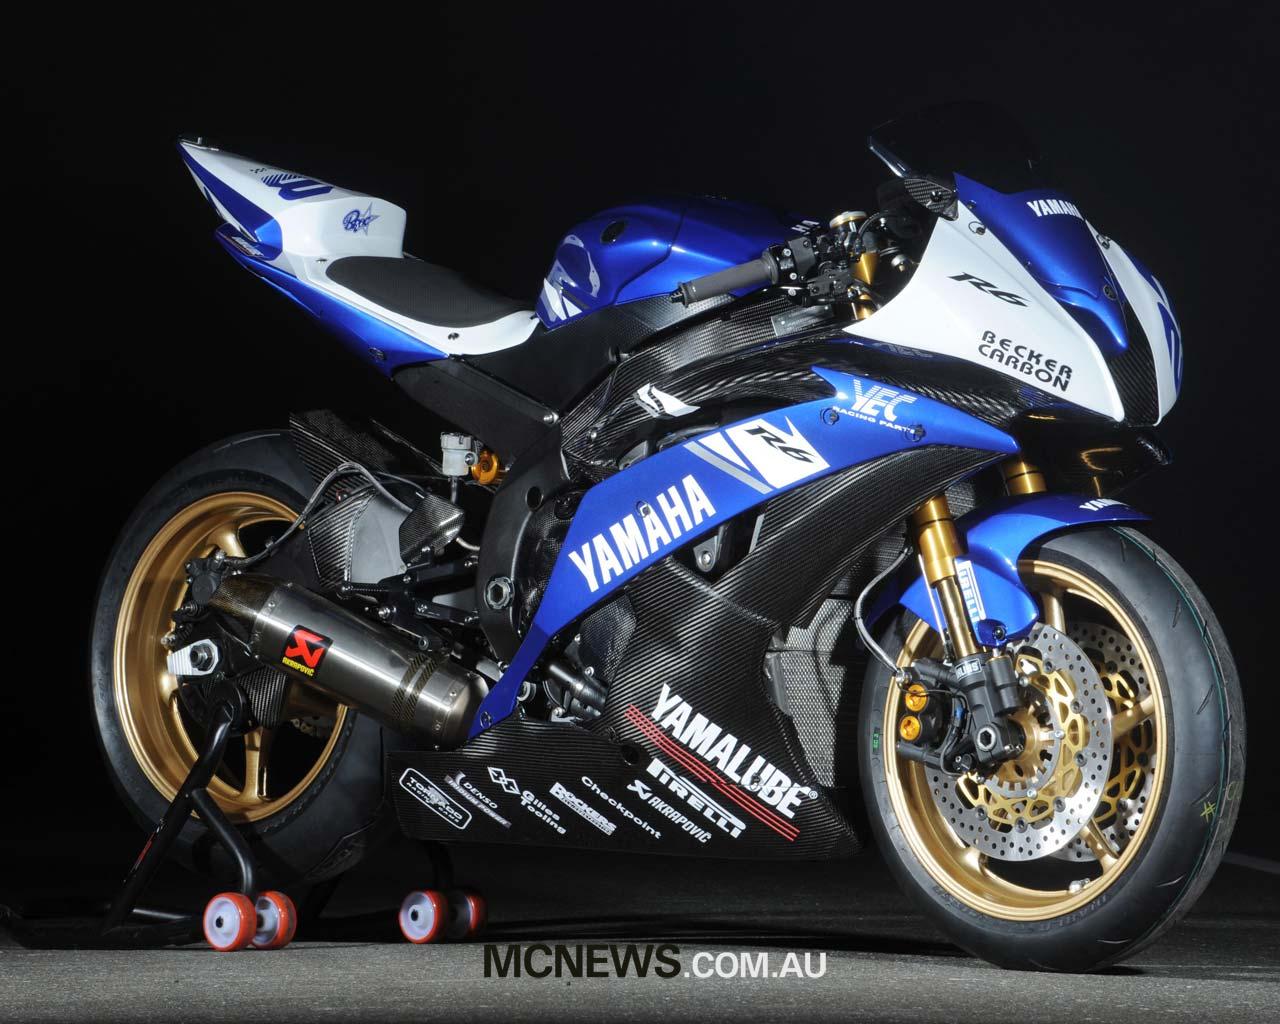 Yamaha R6 Wallpaper 16897 Hd Wallpapers in Bikes   Imagescicom 1280x1024